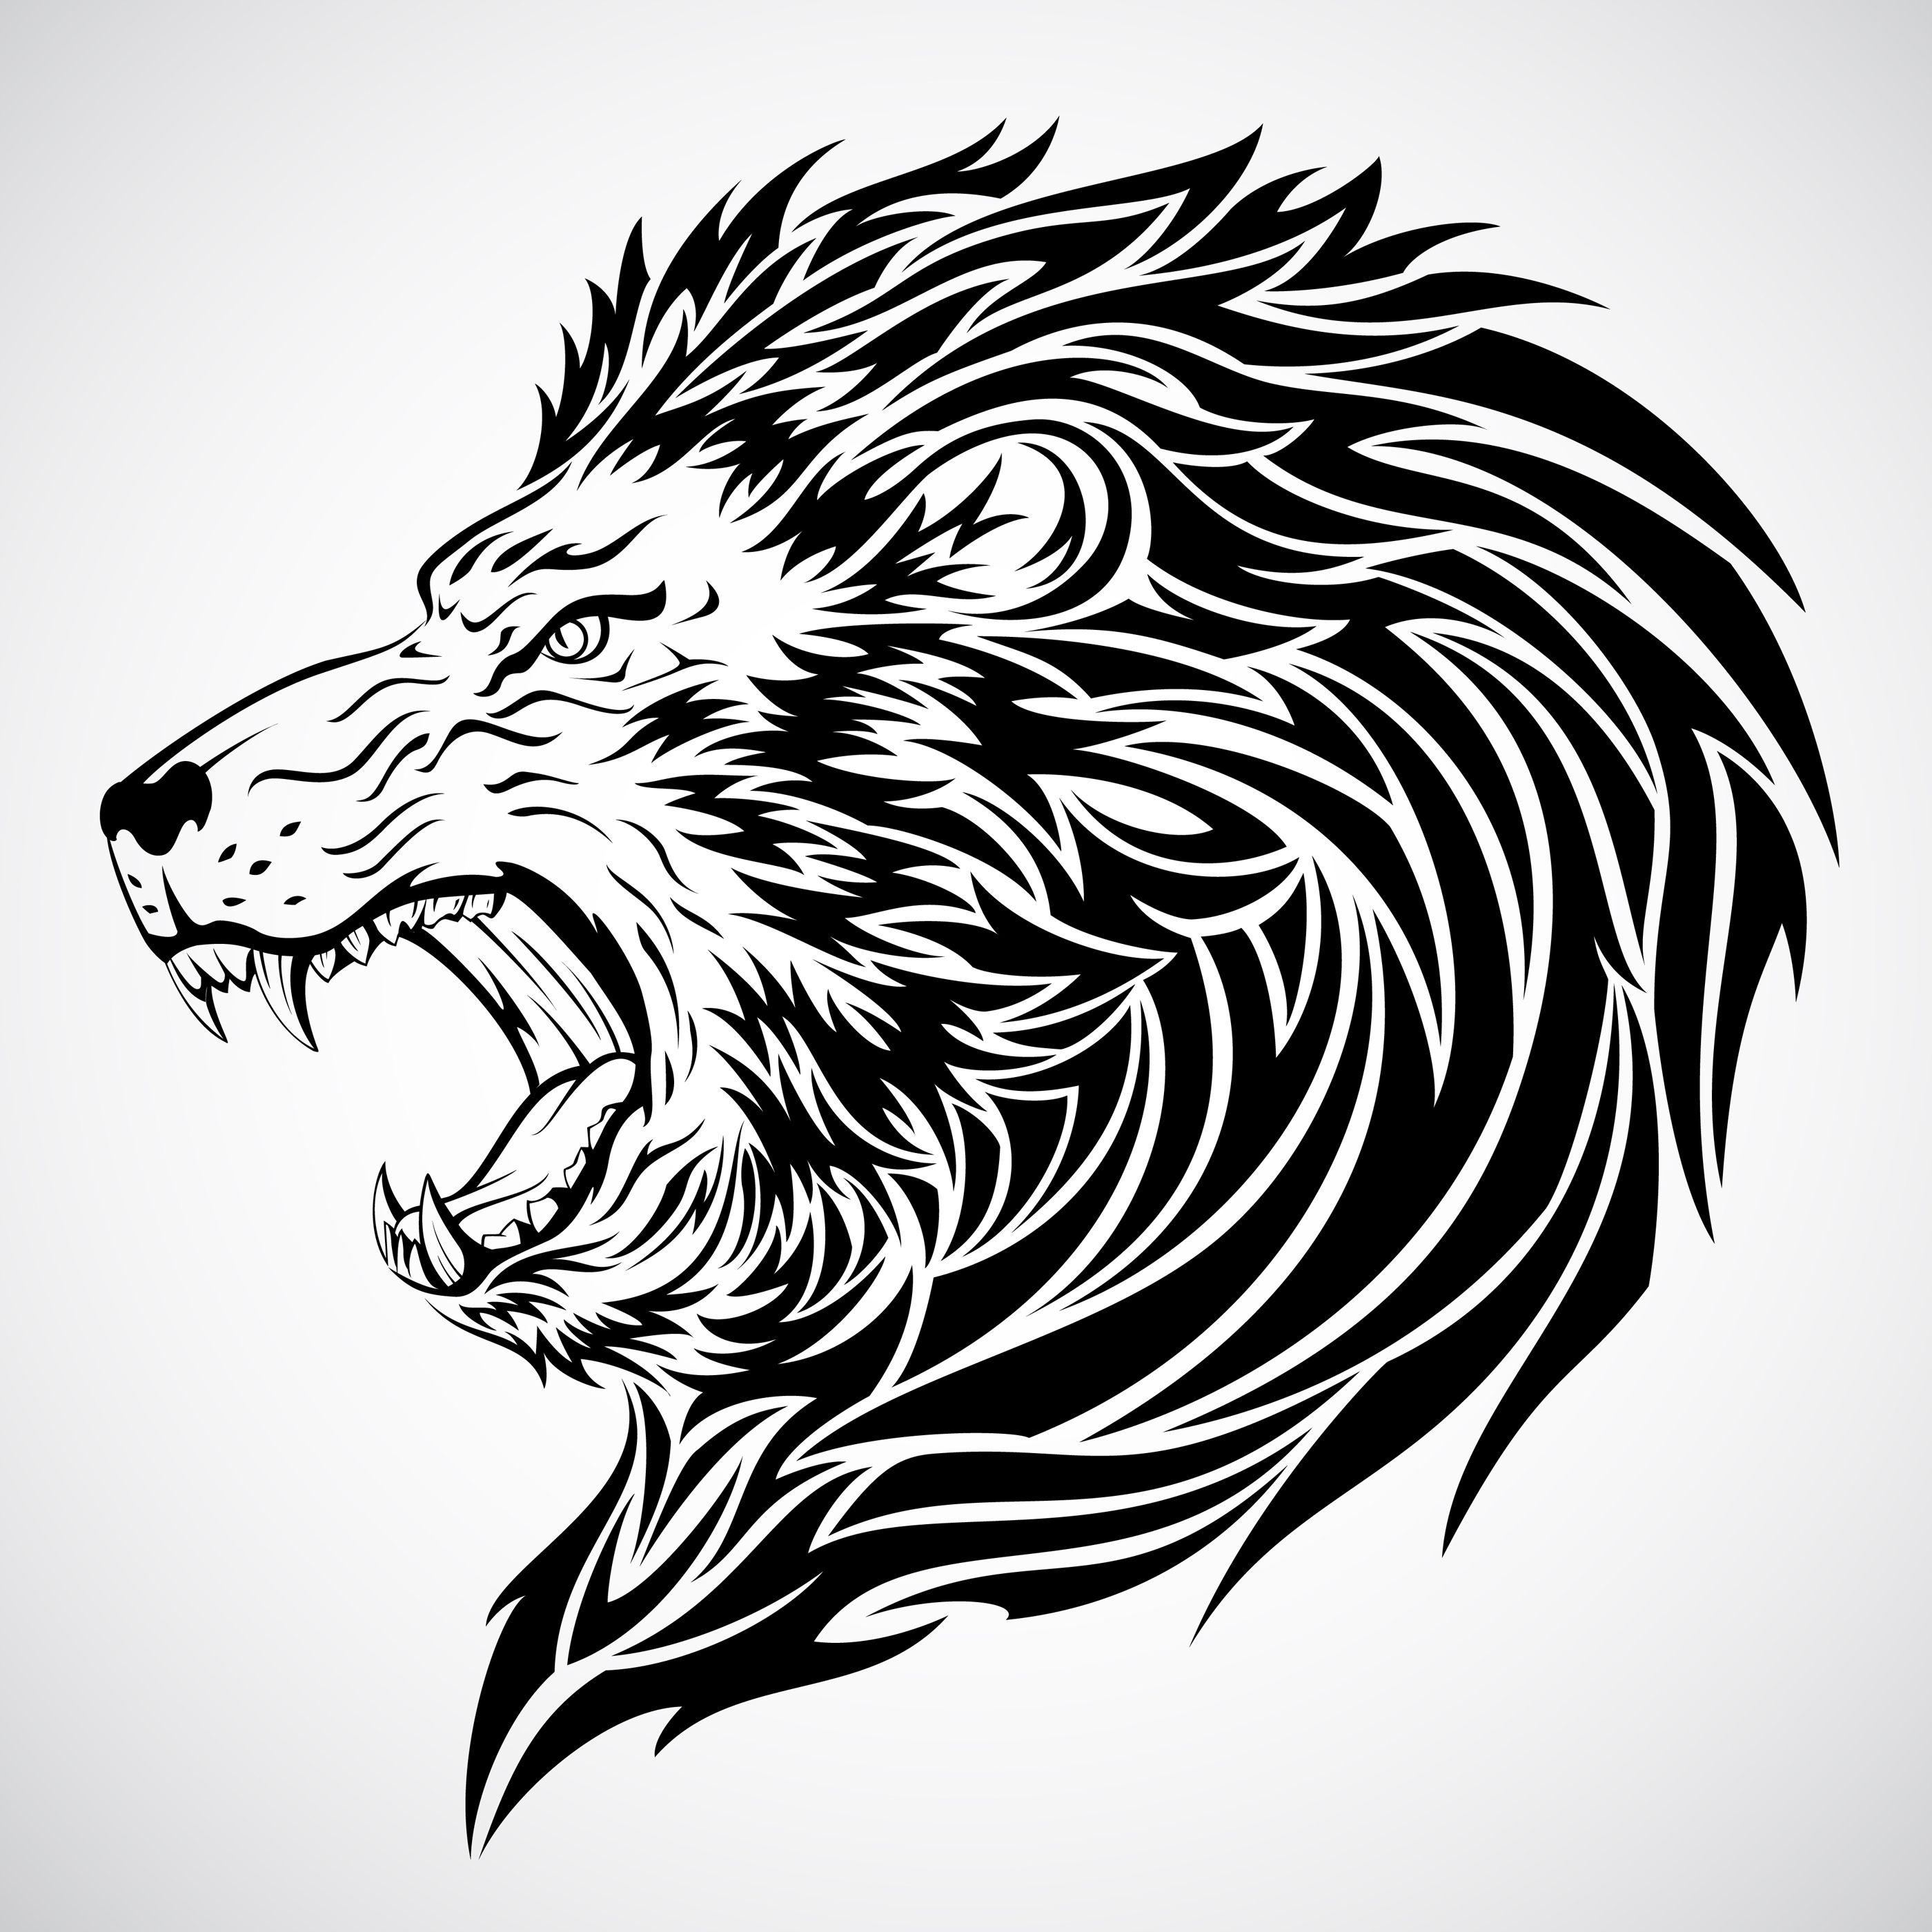 Lion Tribal Head Tattoo Design Tribal Lion Tribal Lion Tattoo Lion Head Tattoos